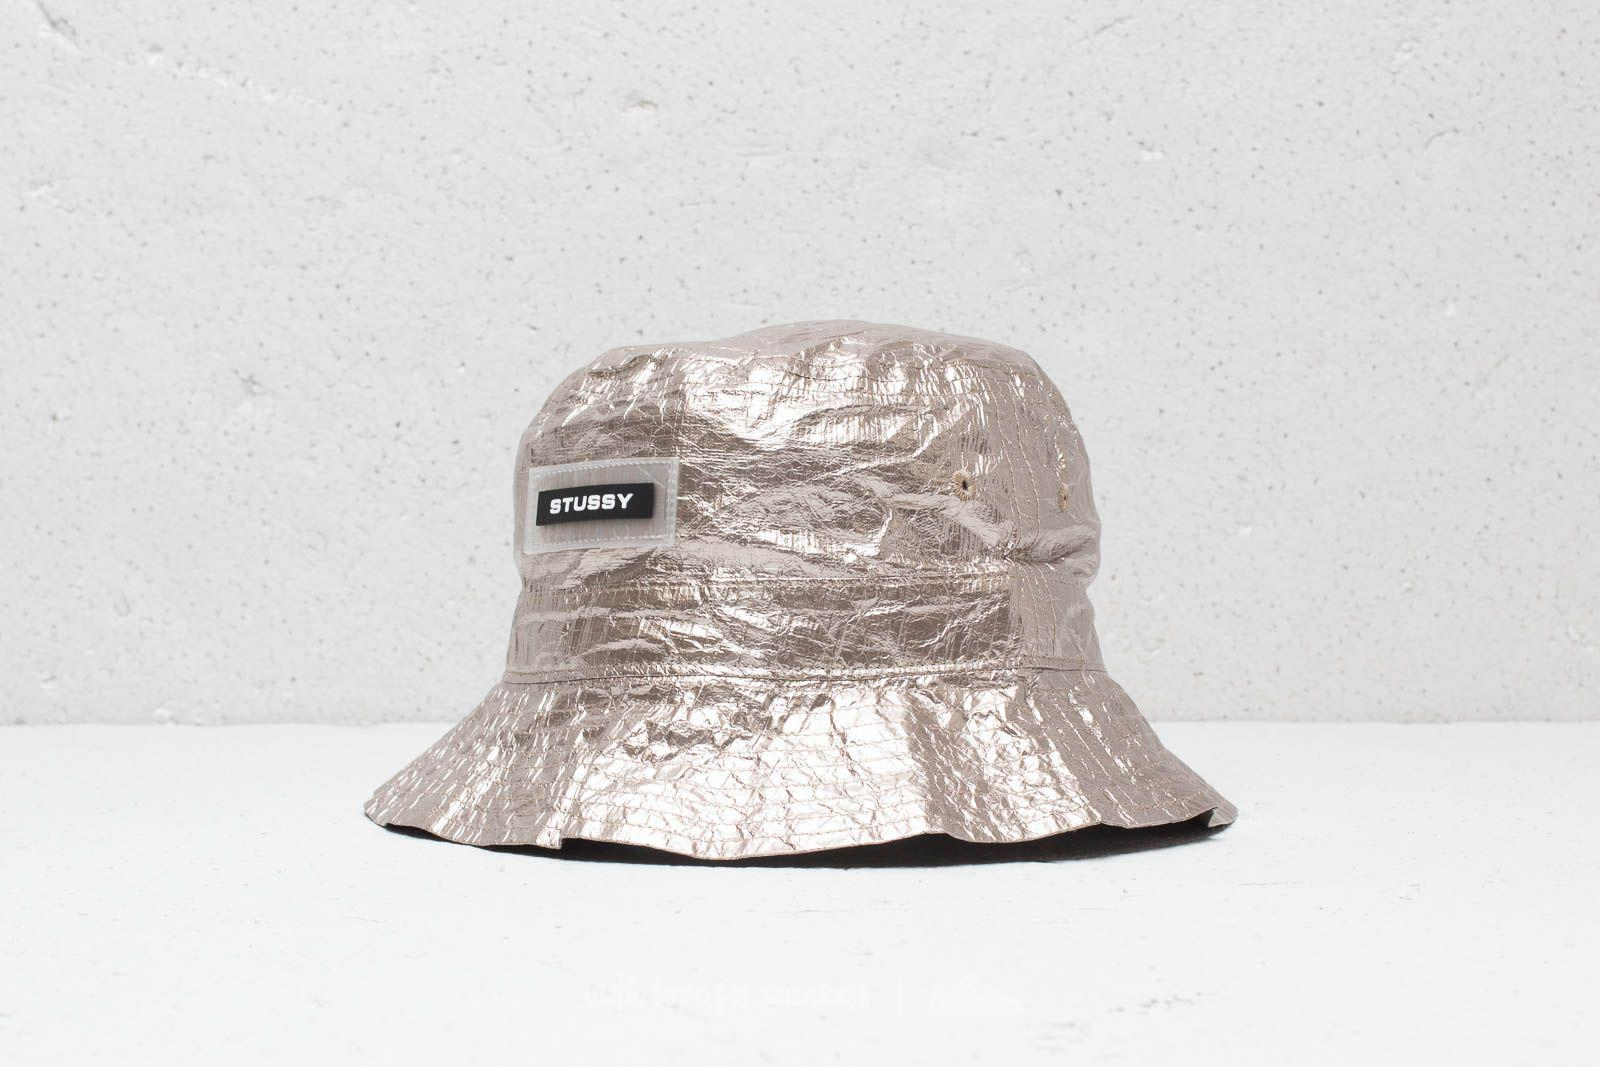 Lyst - Stussy Vera Bucket Hat Silver fc671f2be2e